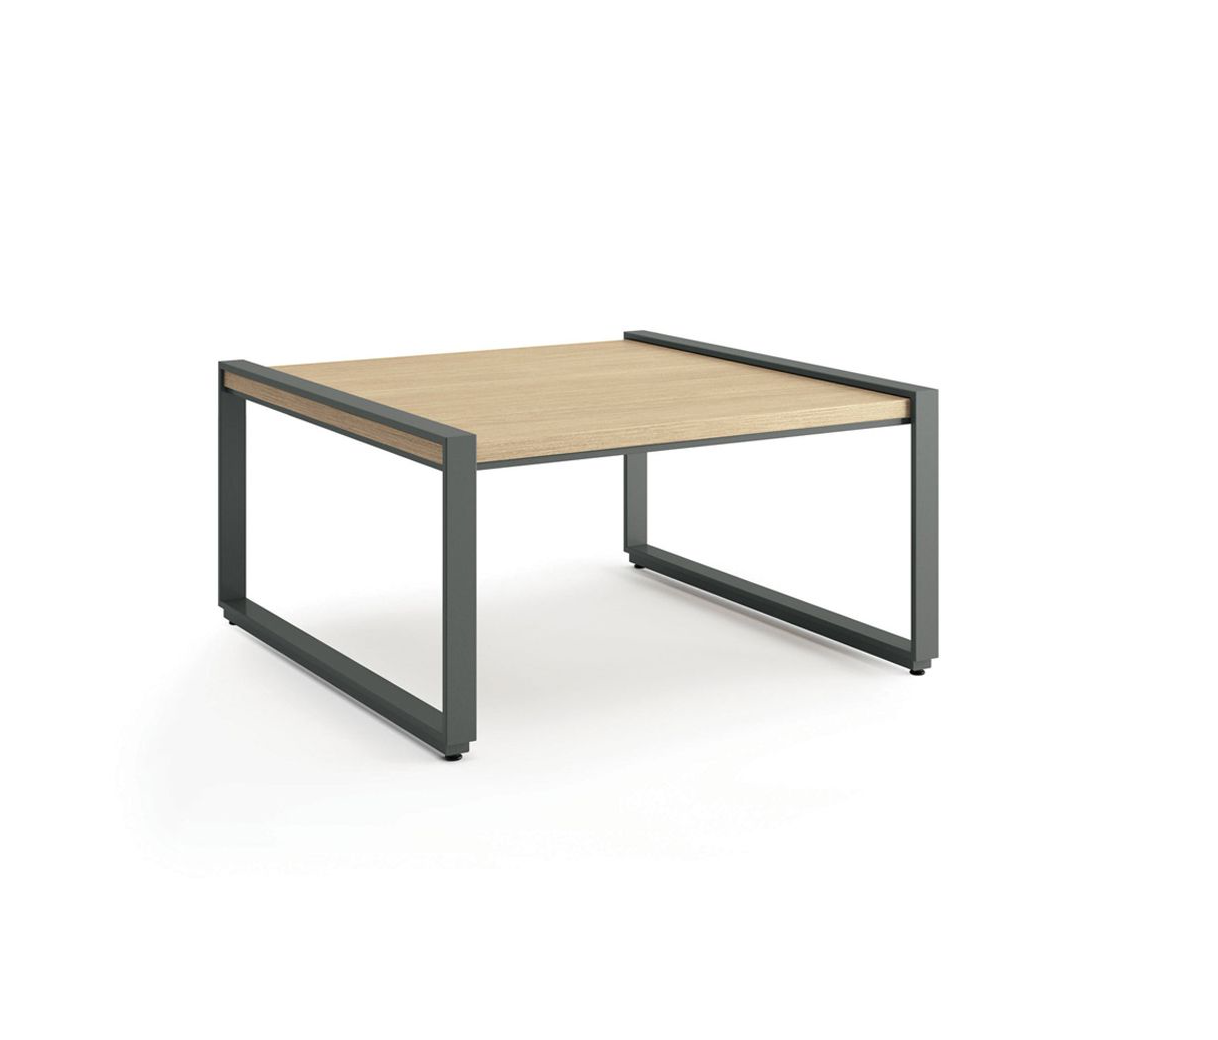 Table: JSI Native